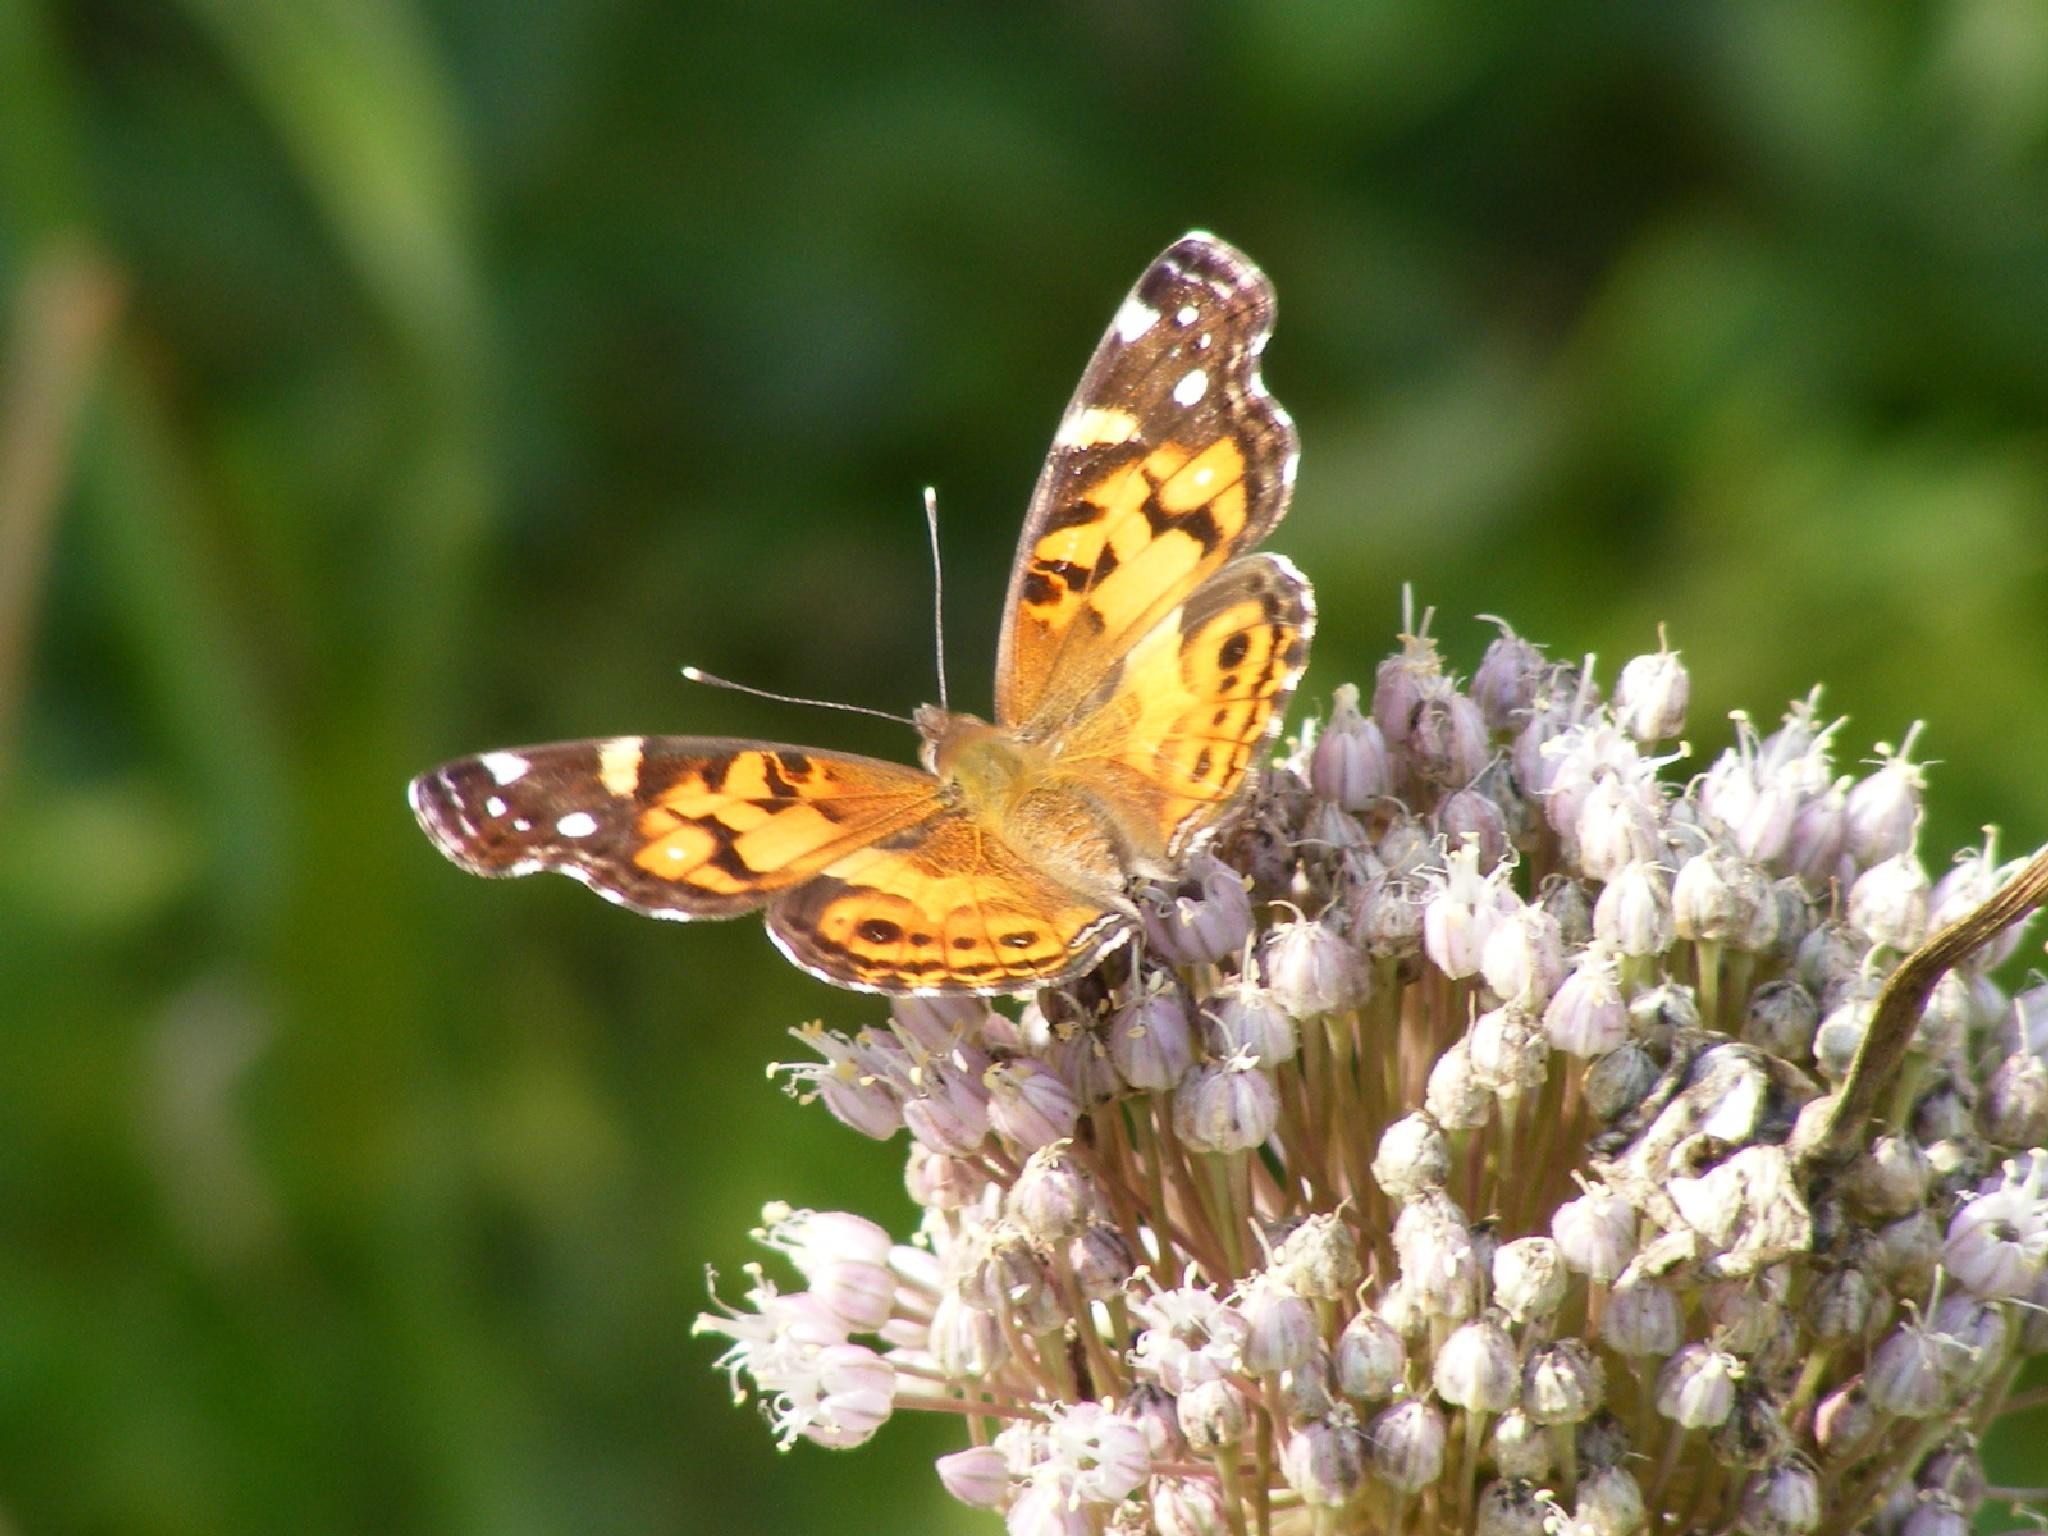 Butterfly with Garlic by Alex Ingram